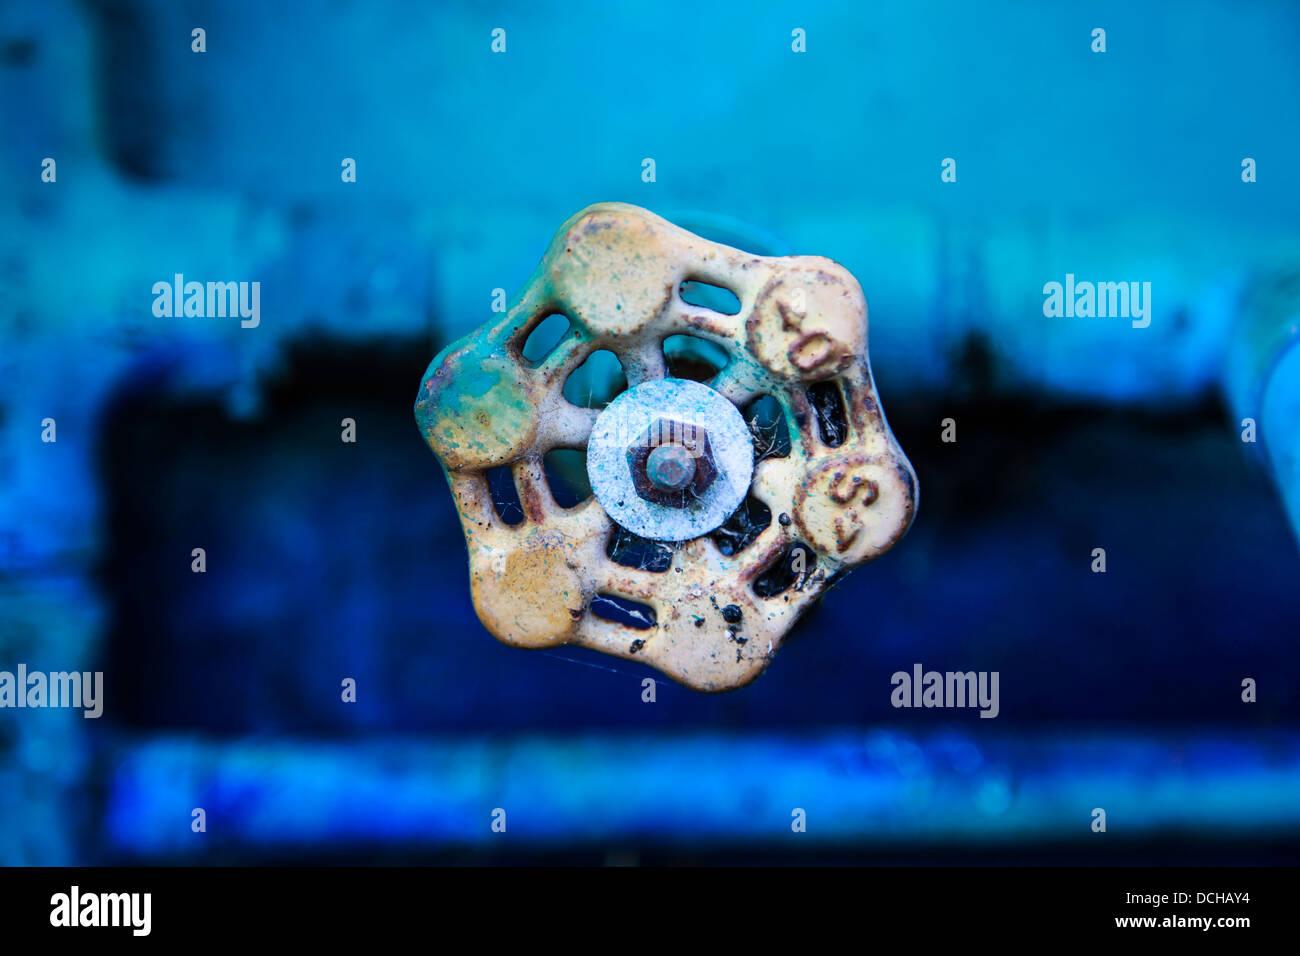 Rusty Spigot Handle Stock Photo: 59388760 - Alamy